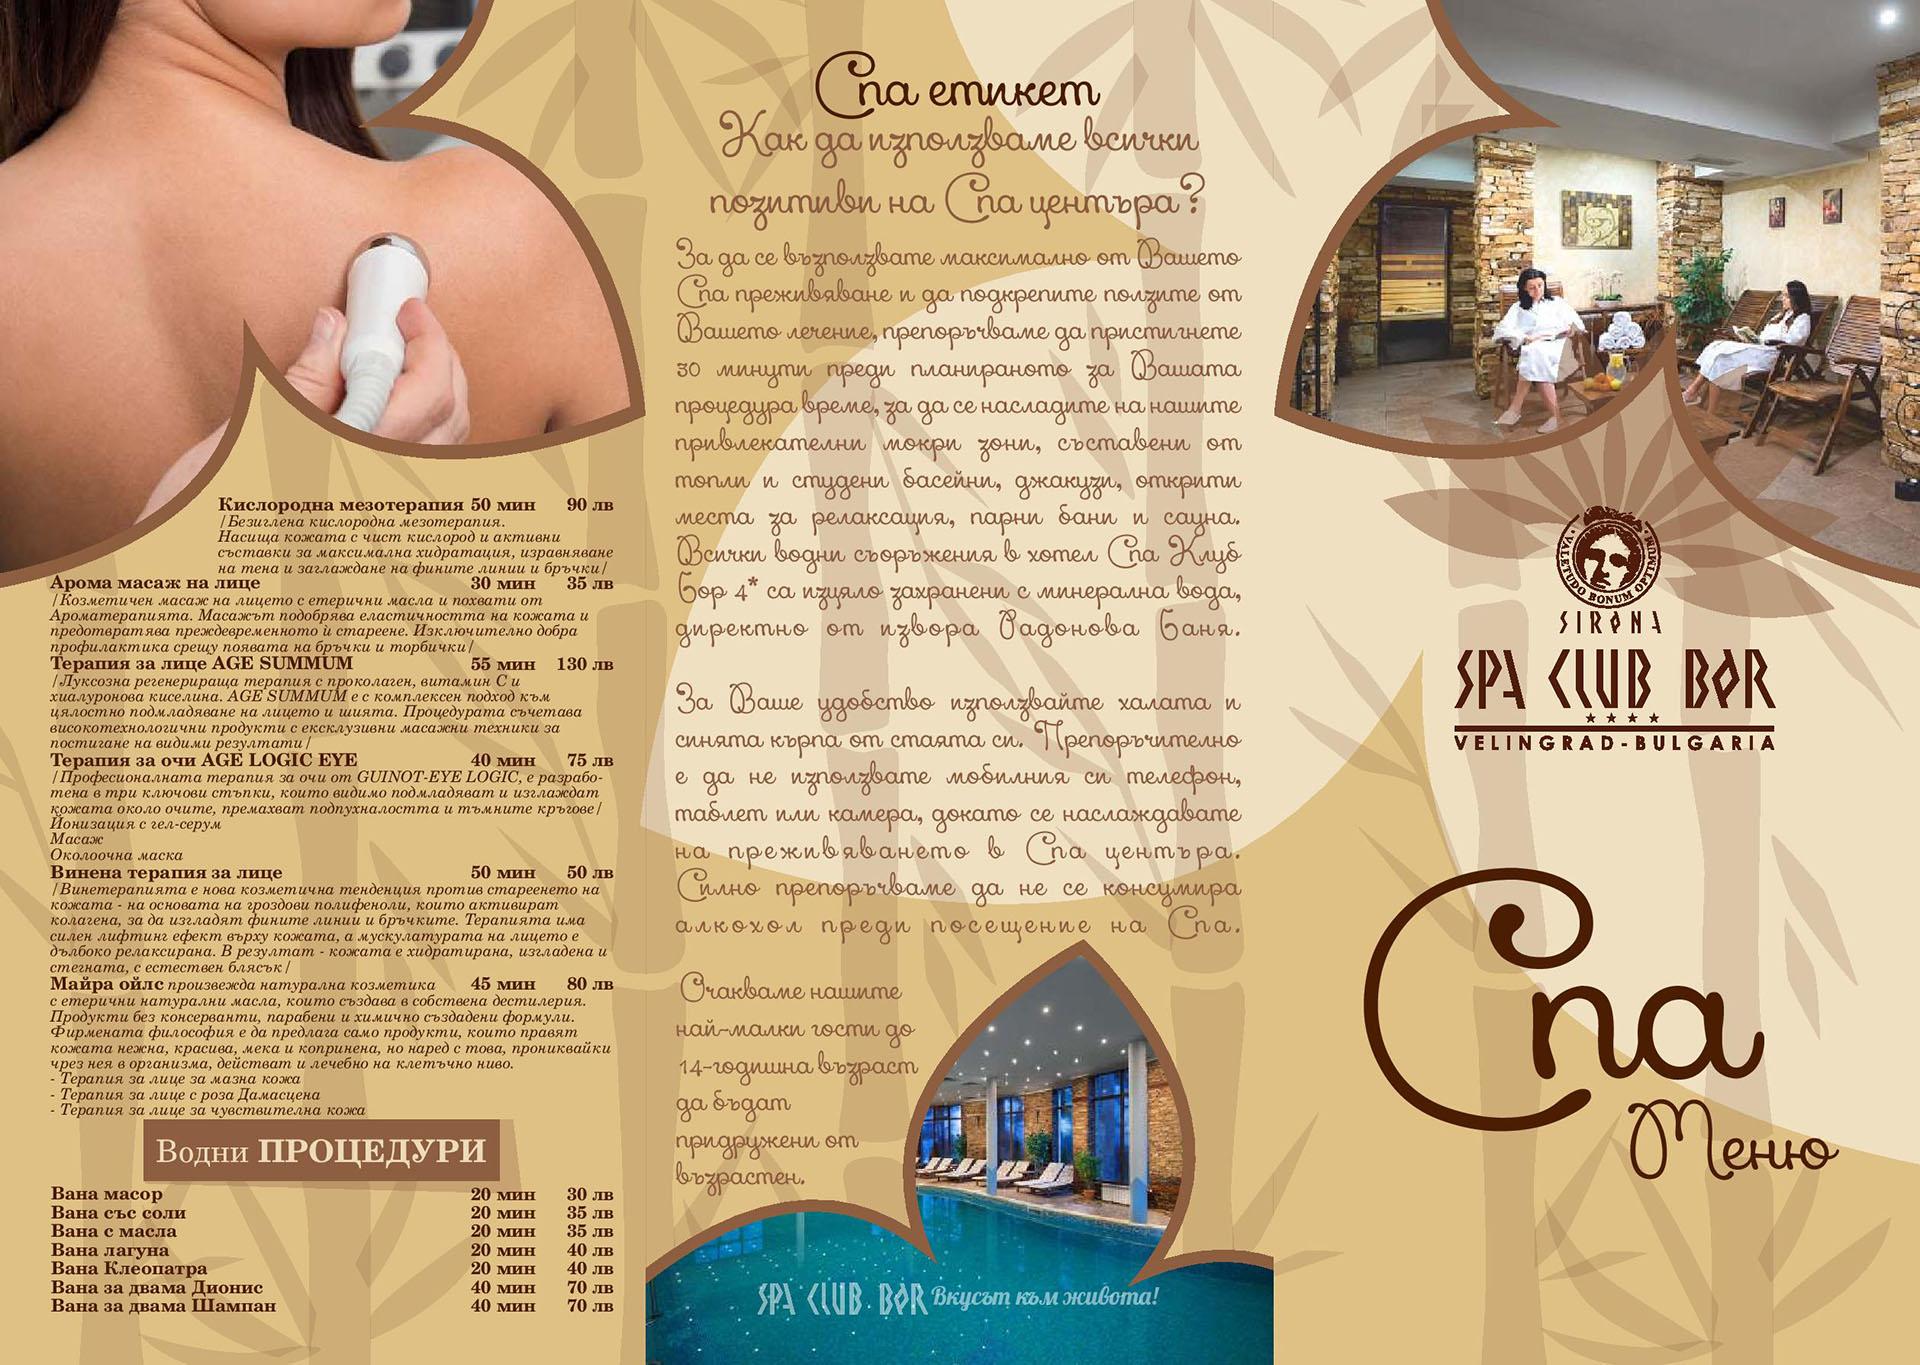 СПА-процедури-в-хотел-Спа-Клуб-Бор-Велинград-водни-процедури-масажи-терапии-за-тяло-терапии-за-лице